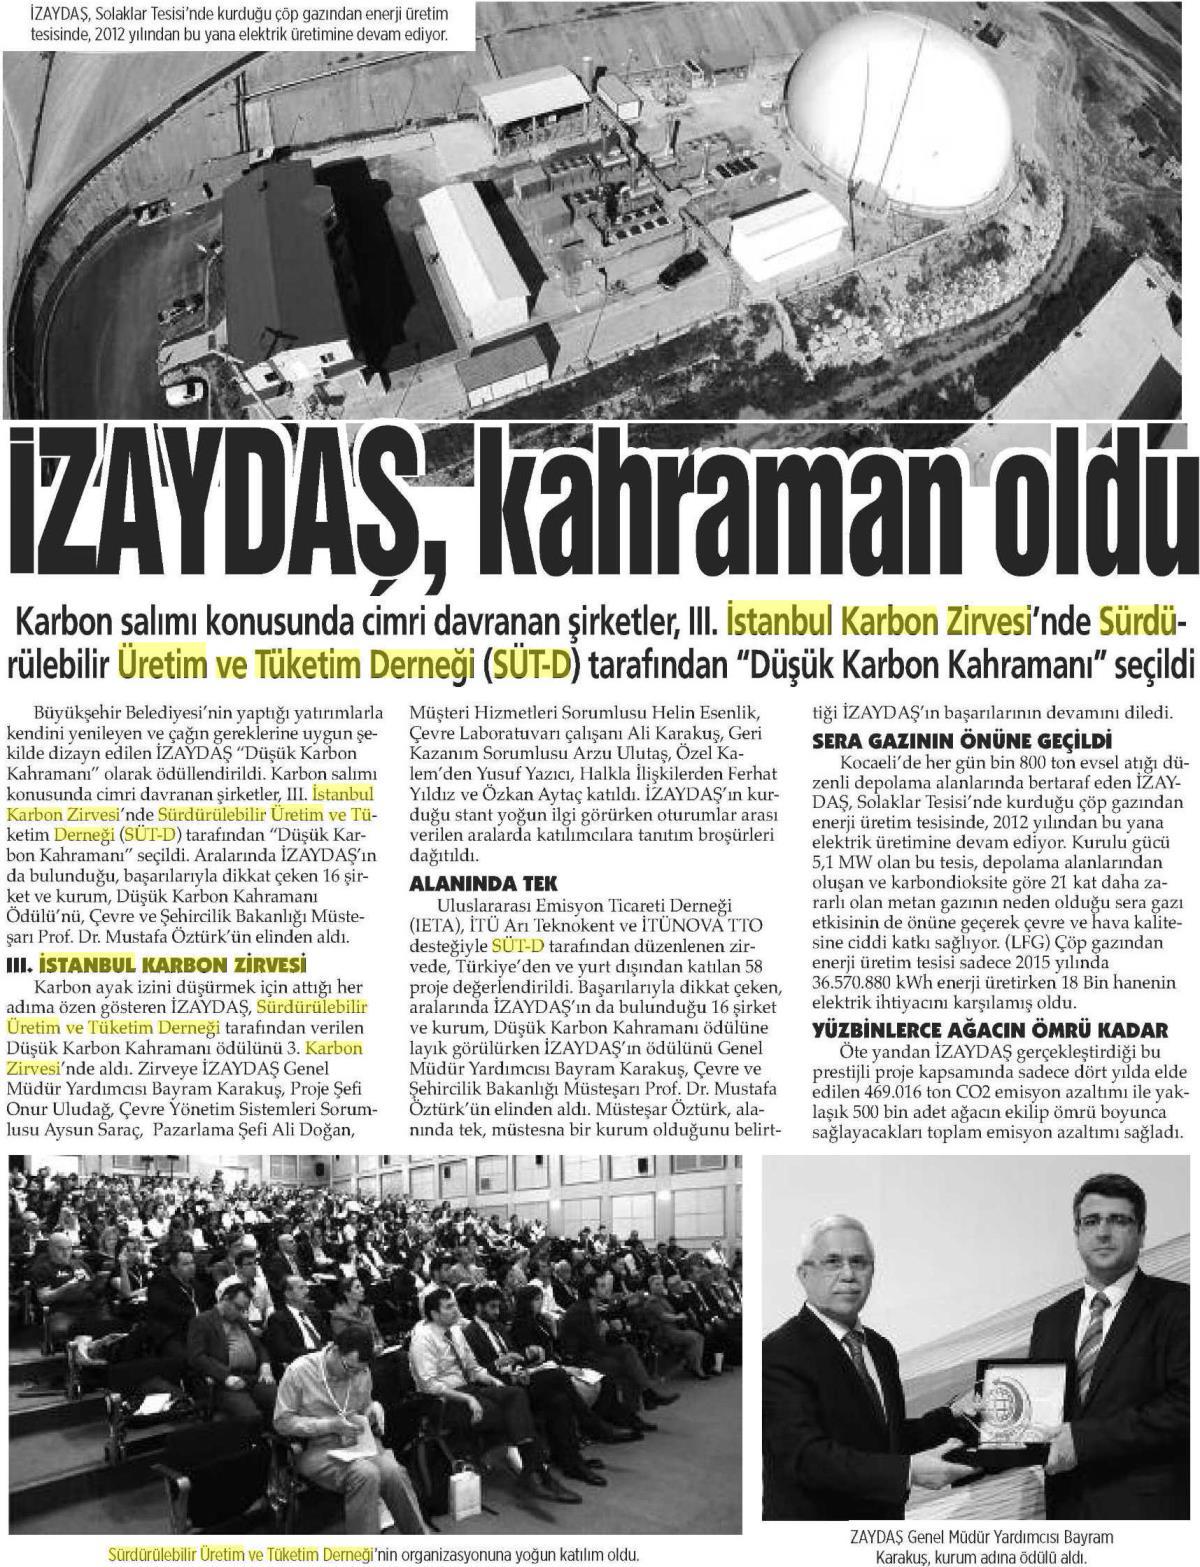 Kocaeli Manşet 30.04.2016